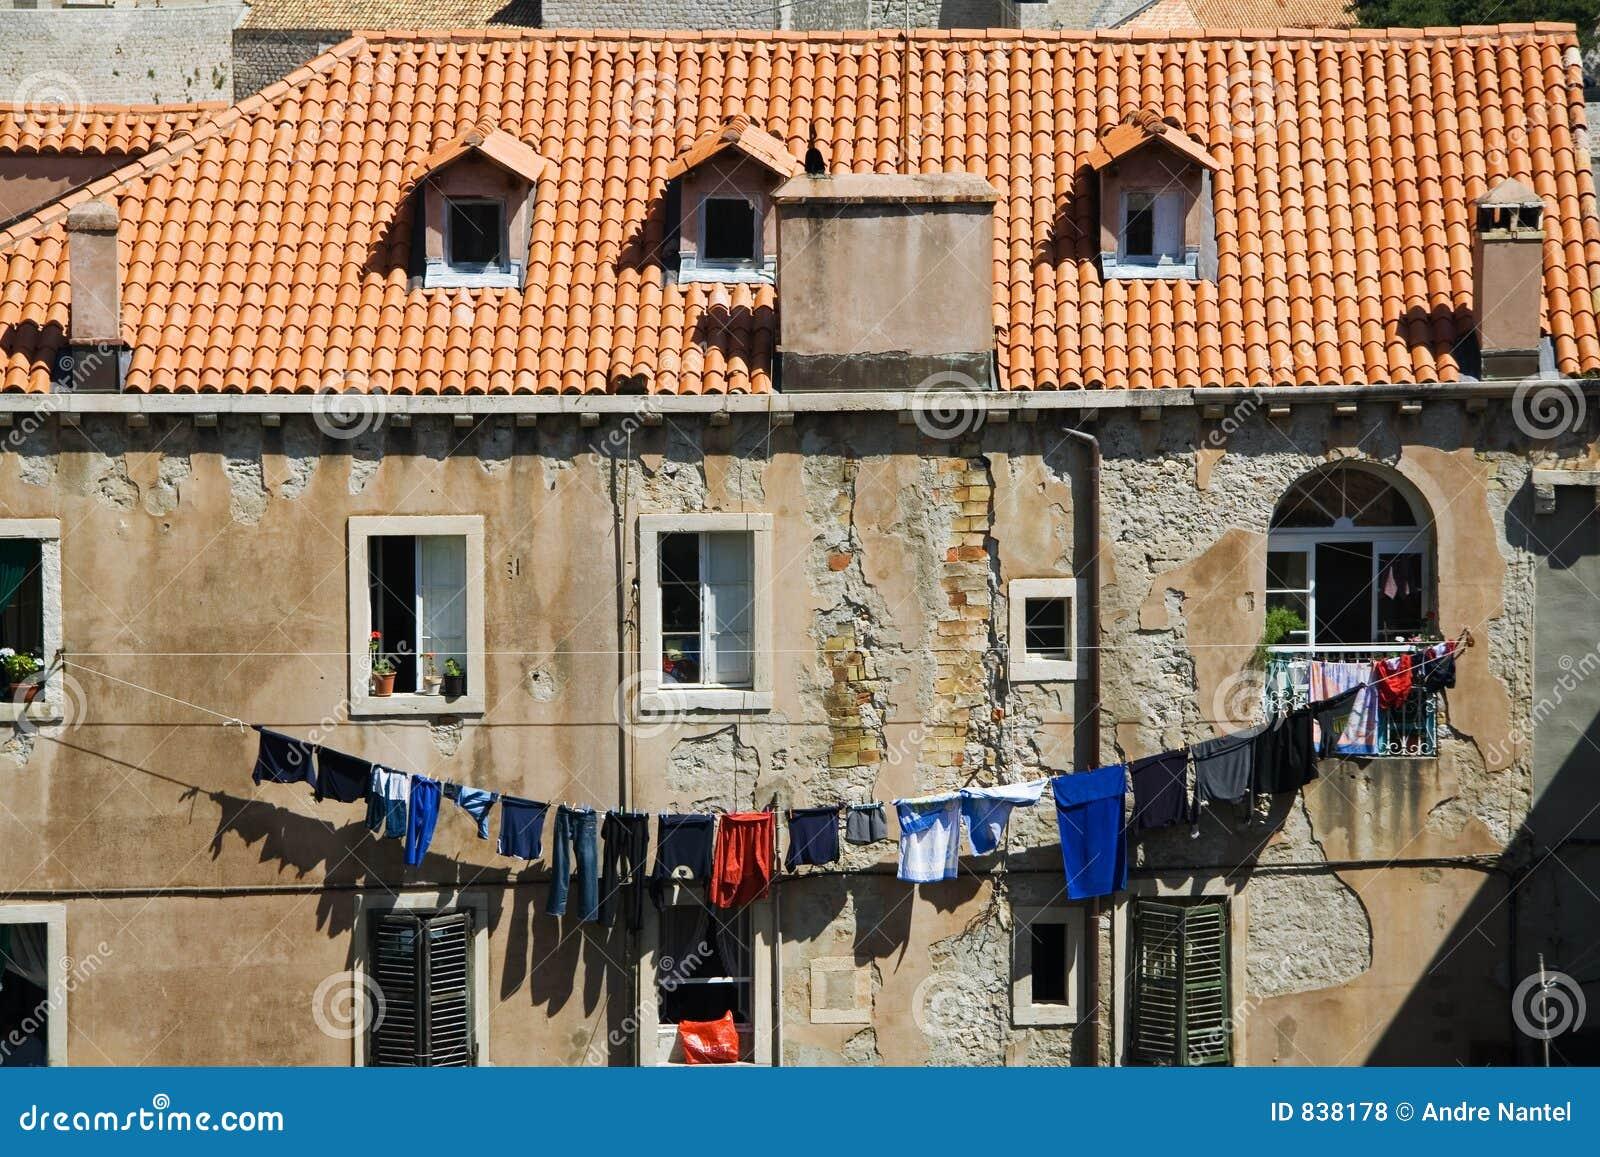 Laundry Day in Dubrovnik